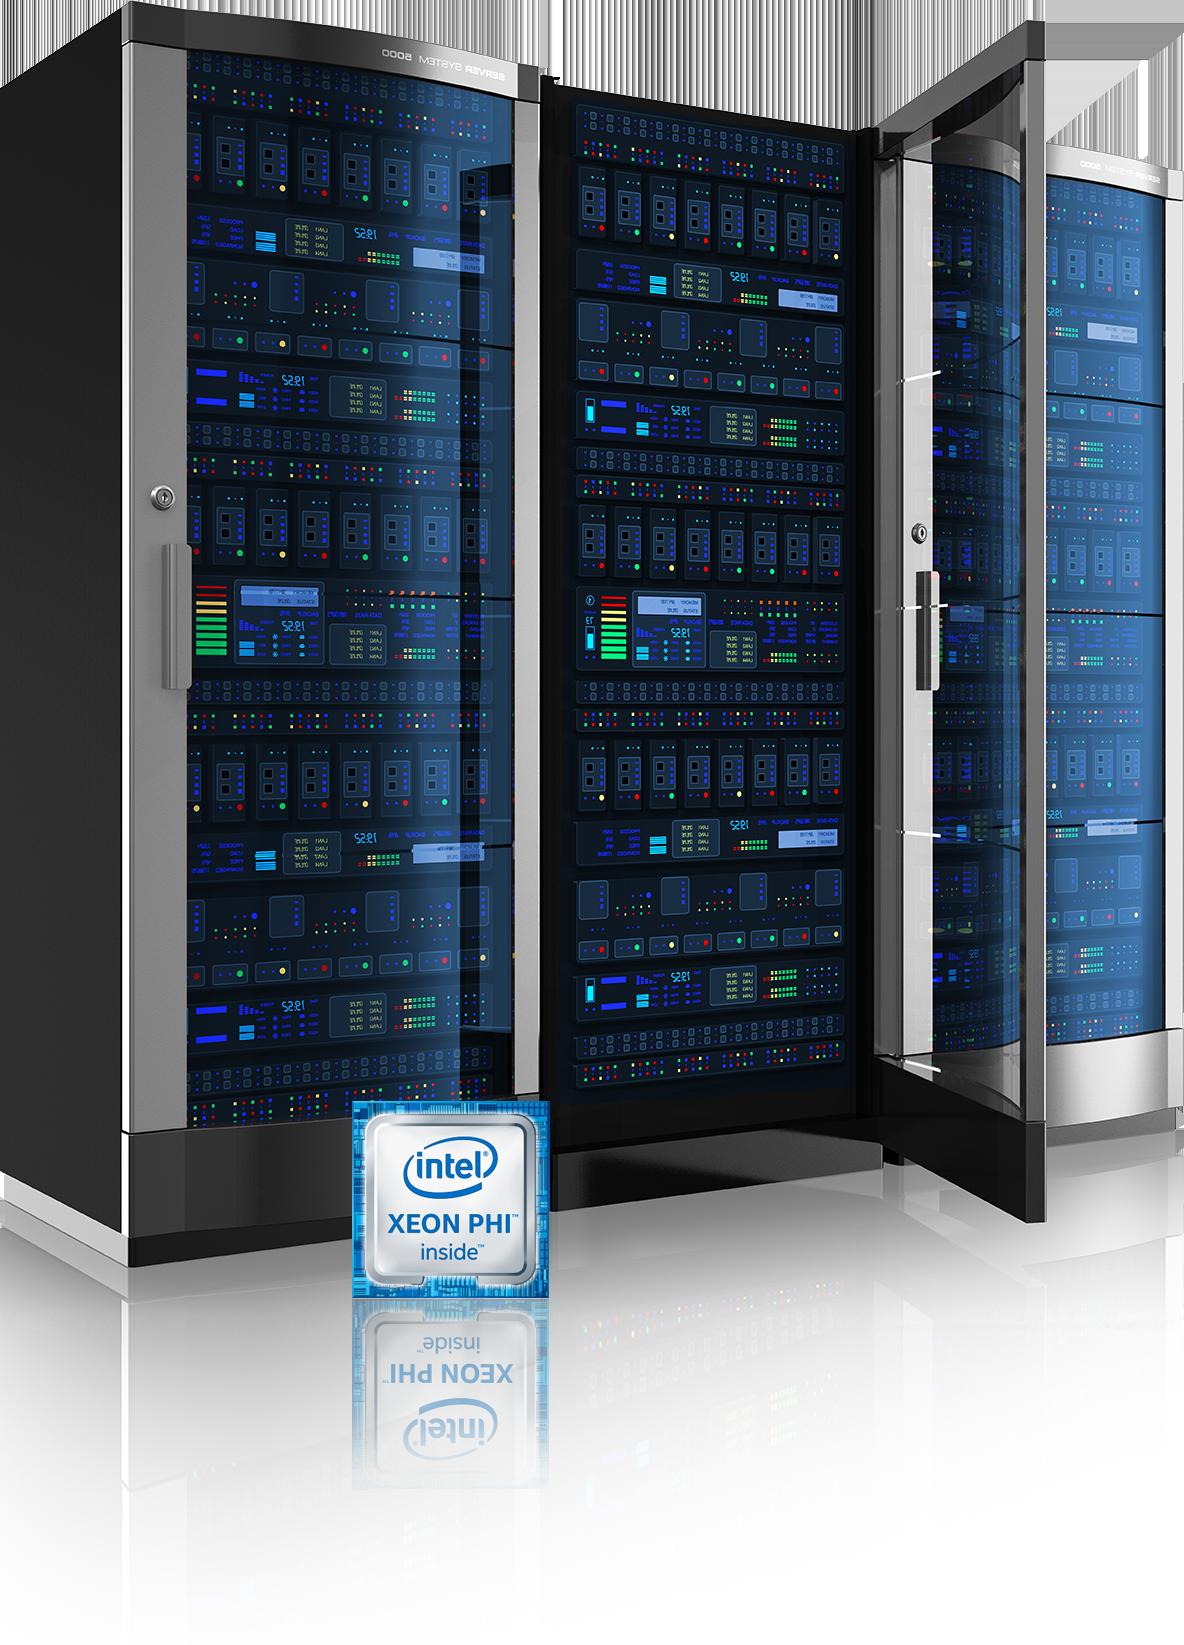 Intel Xeon Phi Clusters